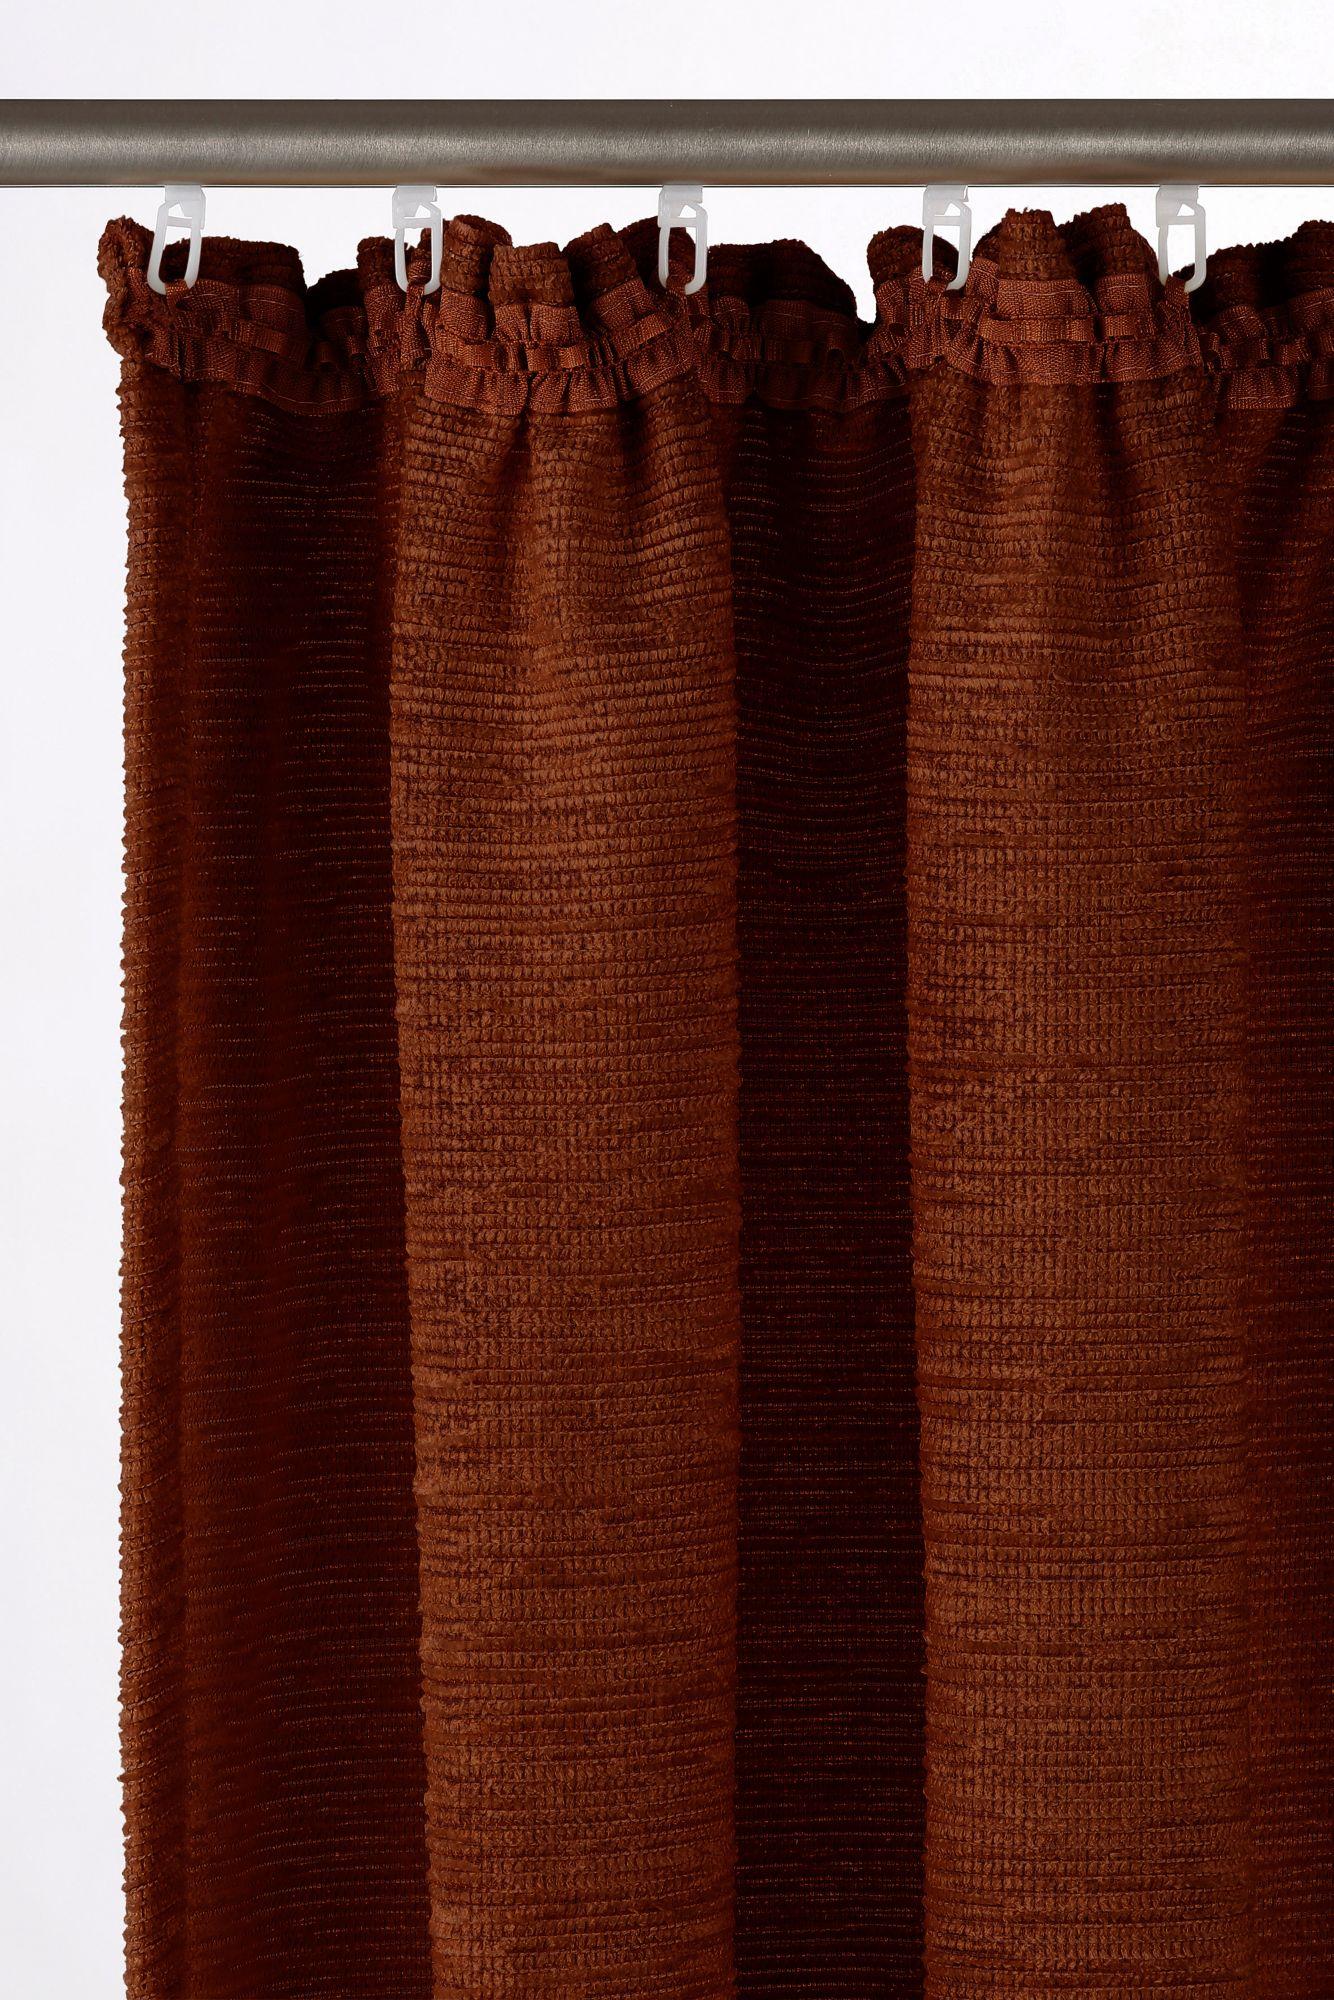 vorhang wirth thermo chenille stavanger 328 g m 1. Black Bedroom Furniture Sets. Home Design Ideas